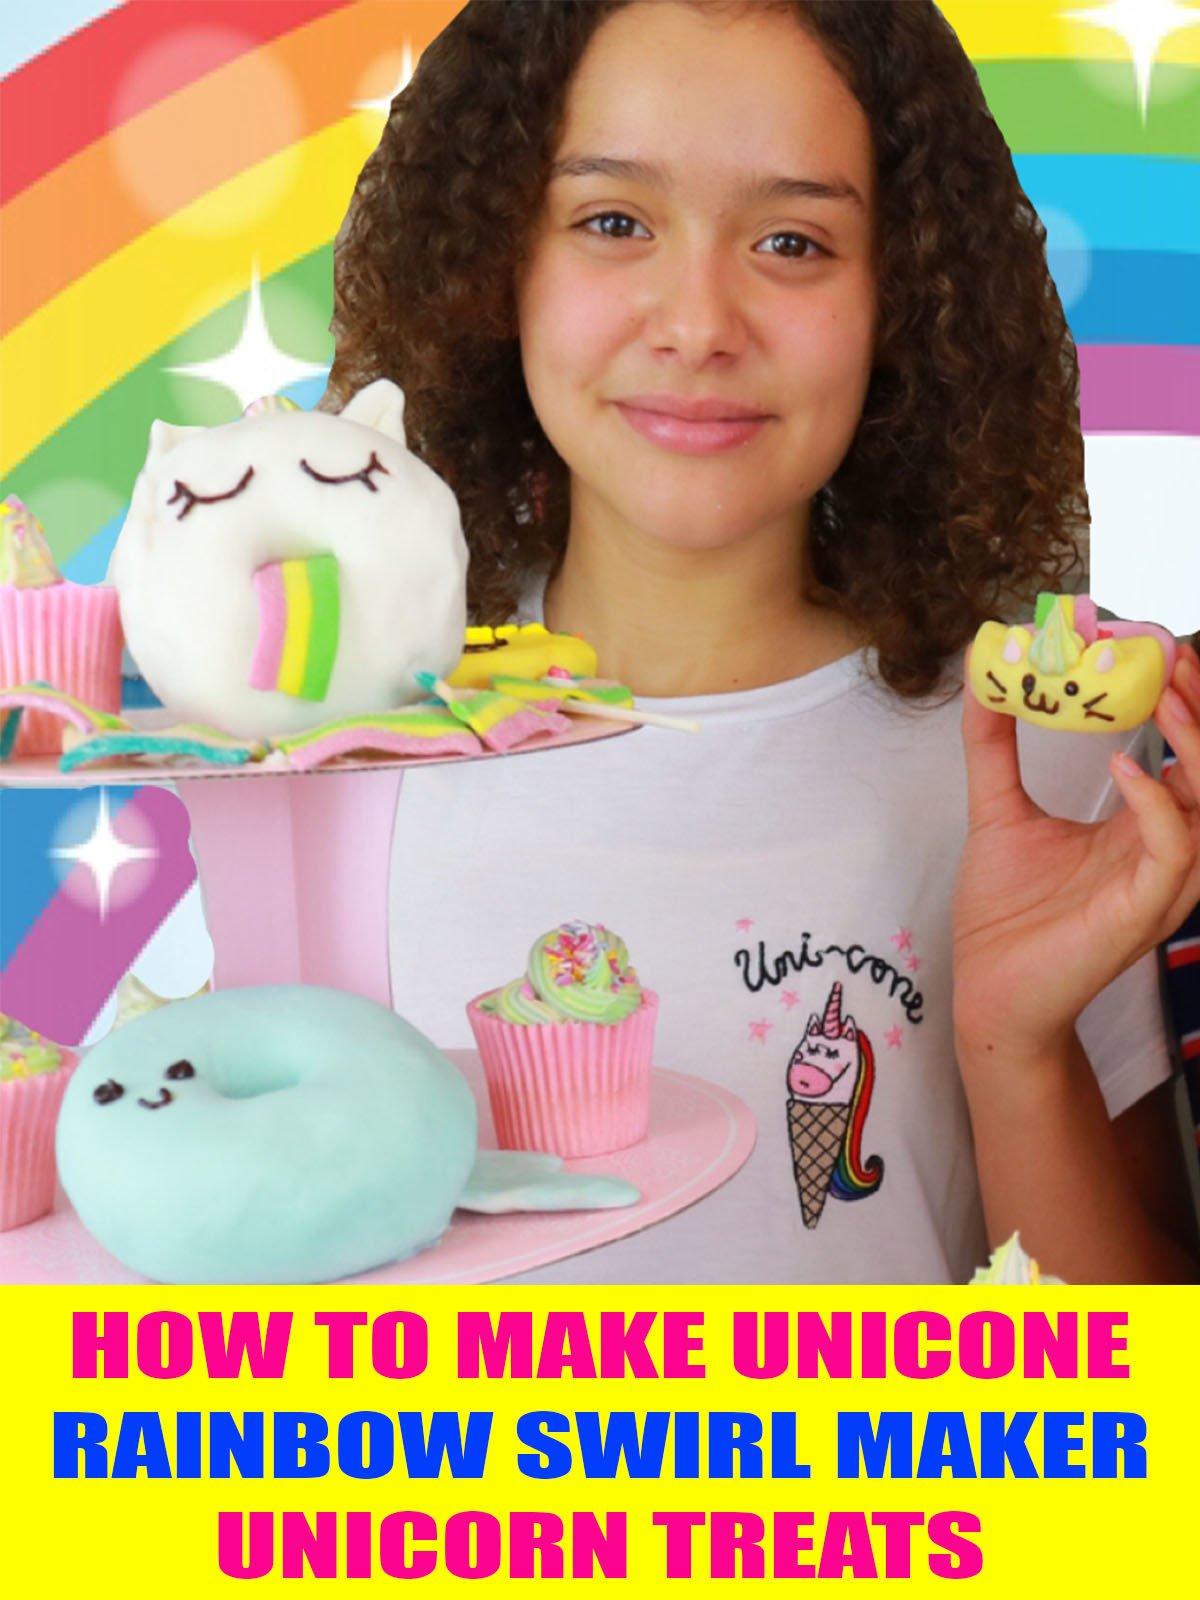 How to Make Unicone Rainbow Swirl Maker Unicorn Treats